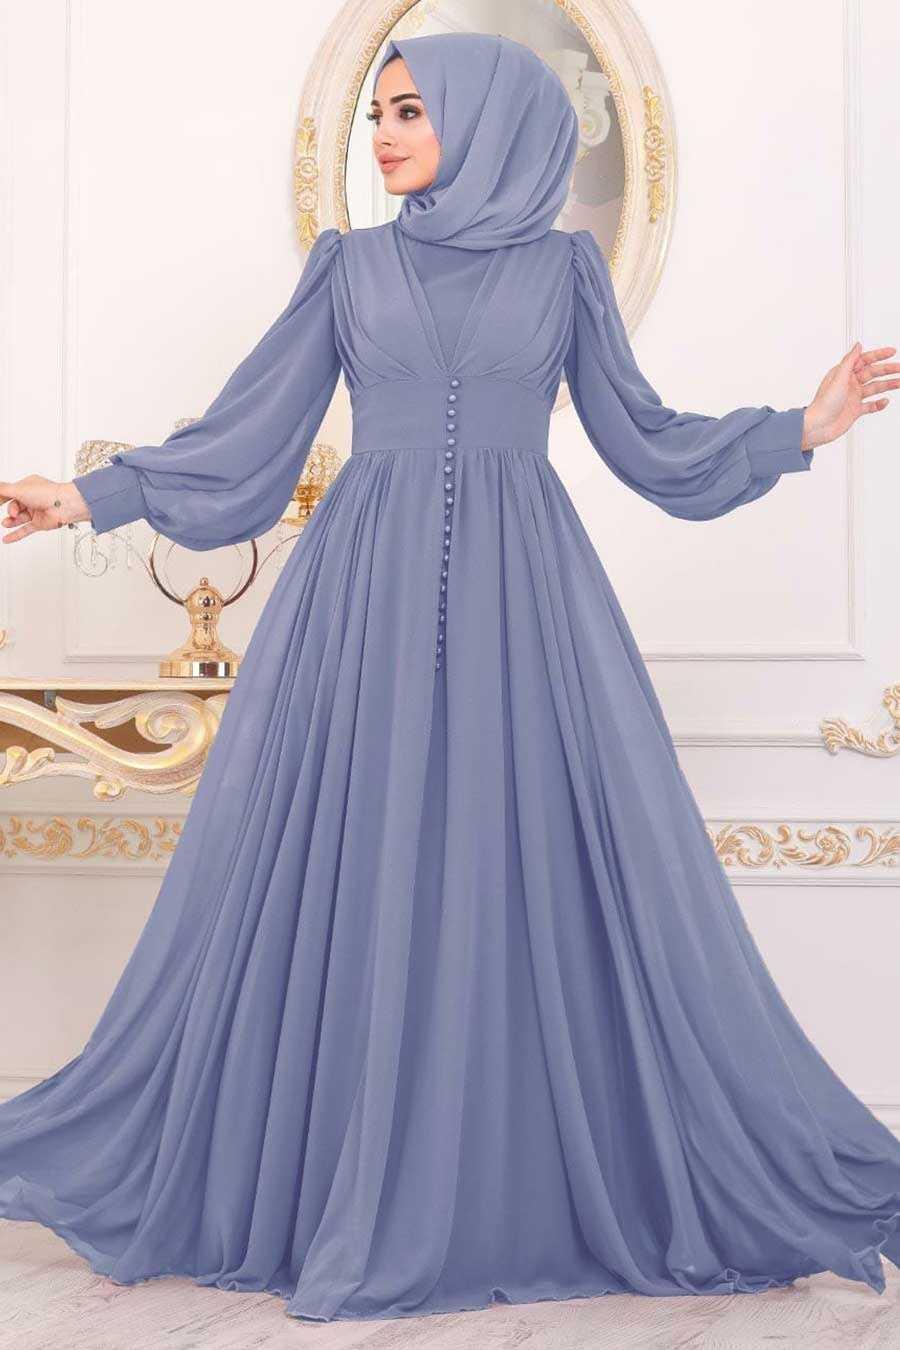 İndigo Blue Hijab Evening Dress 41011IM